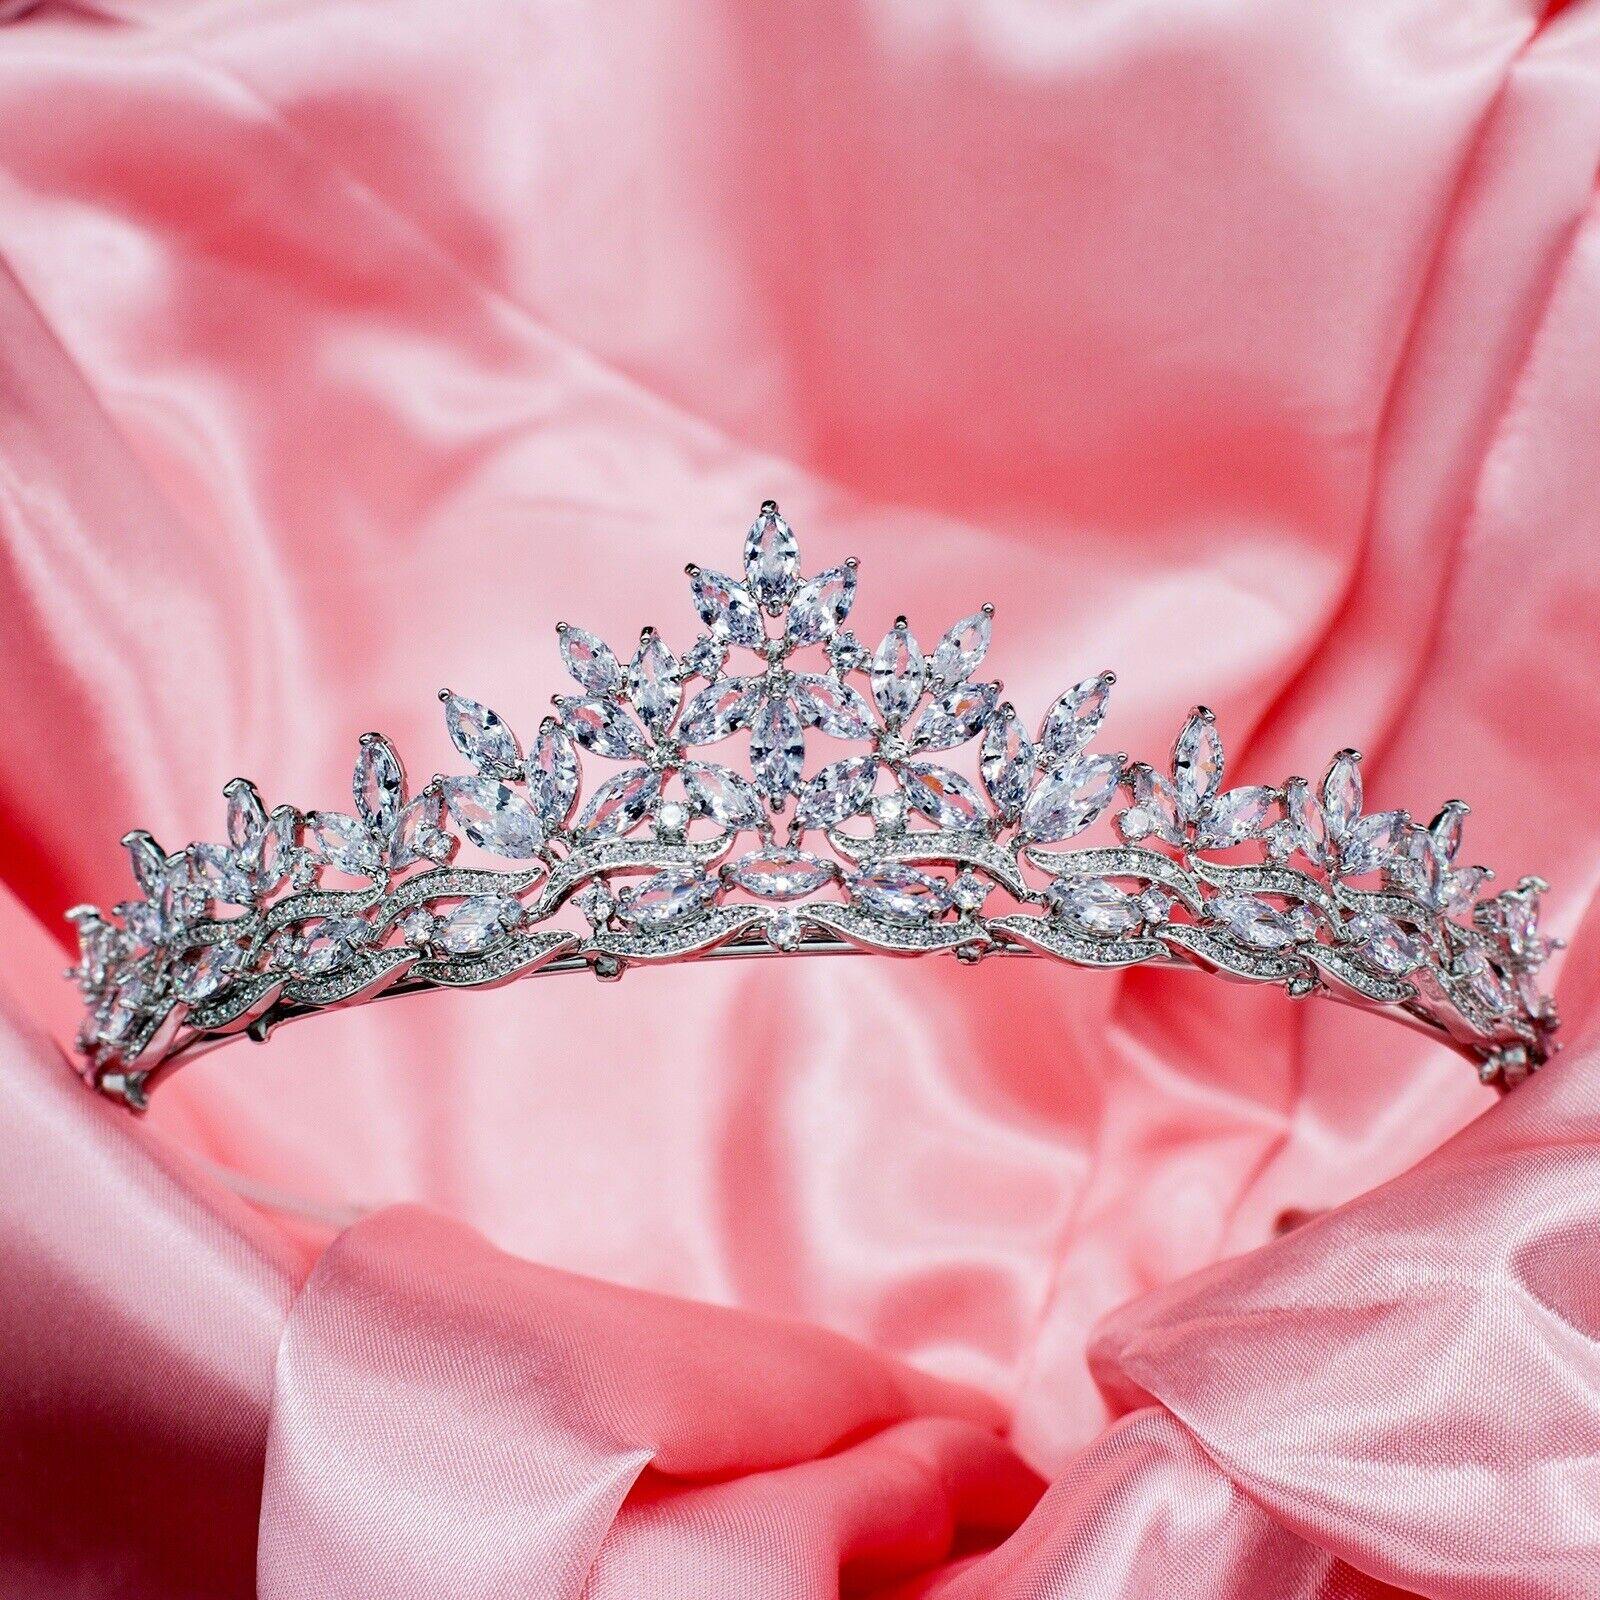 Tiara Set With AAA Cubic Zircnonias crown design Rhodium Plated